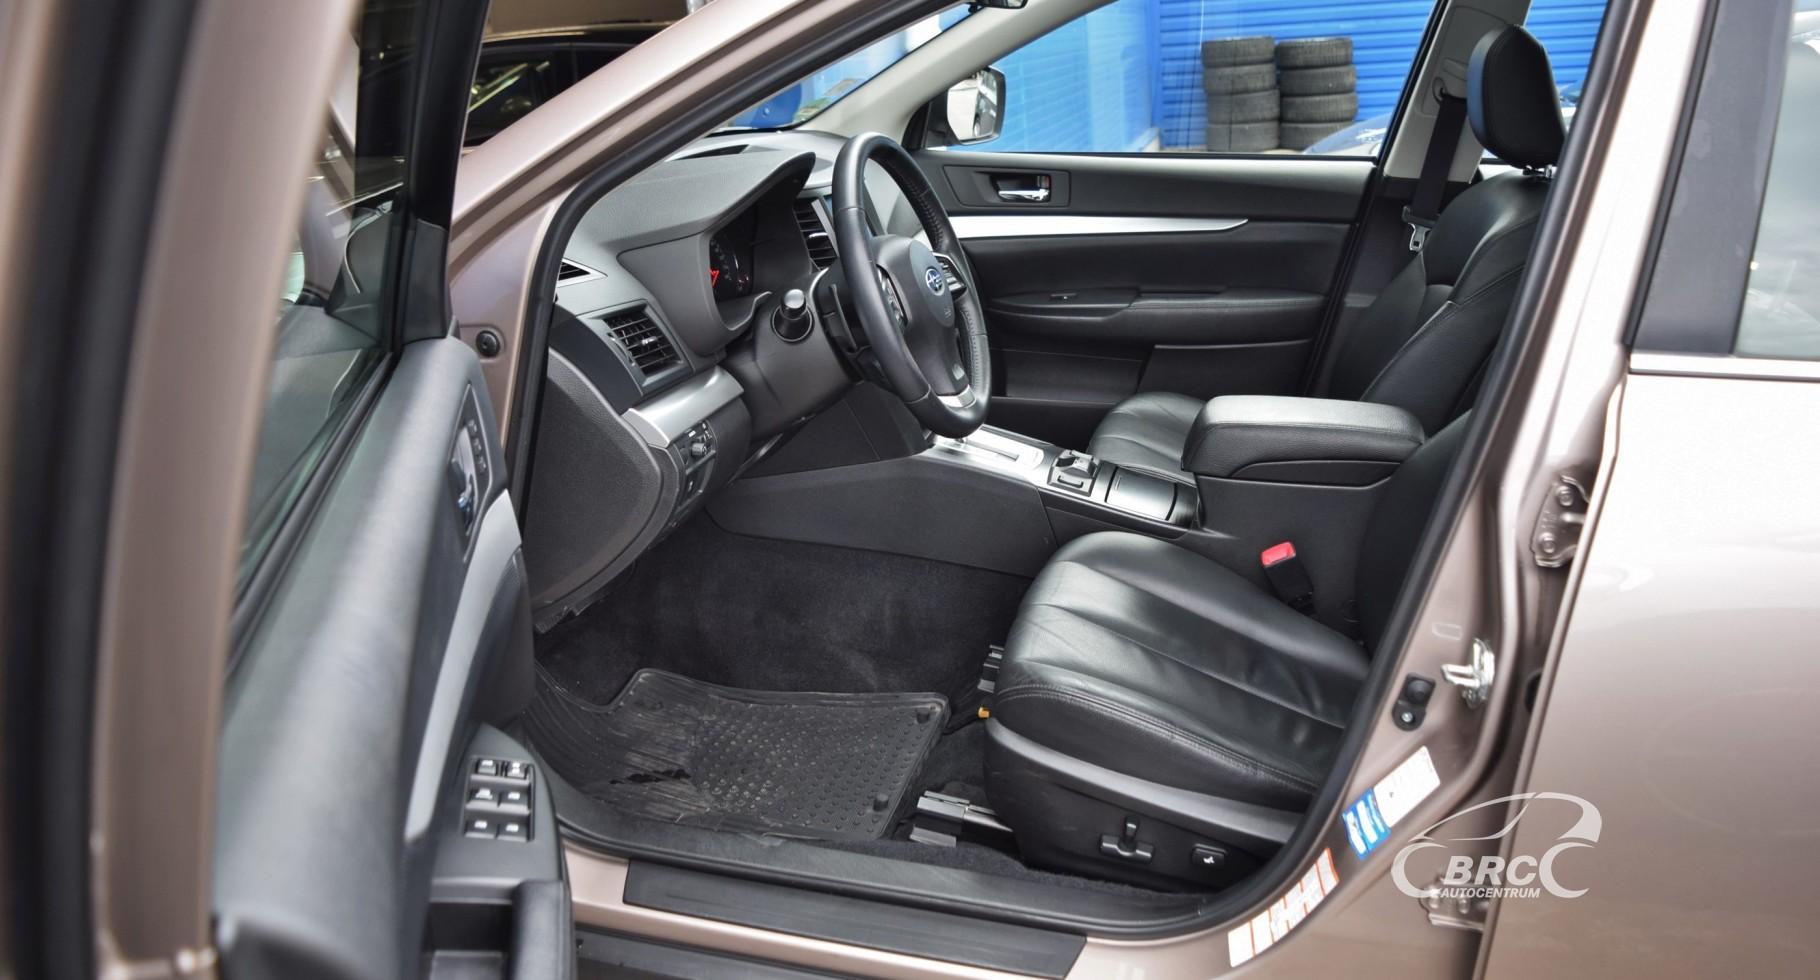 Subaru Legacy Outback Symmetrical AWD